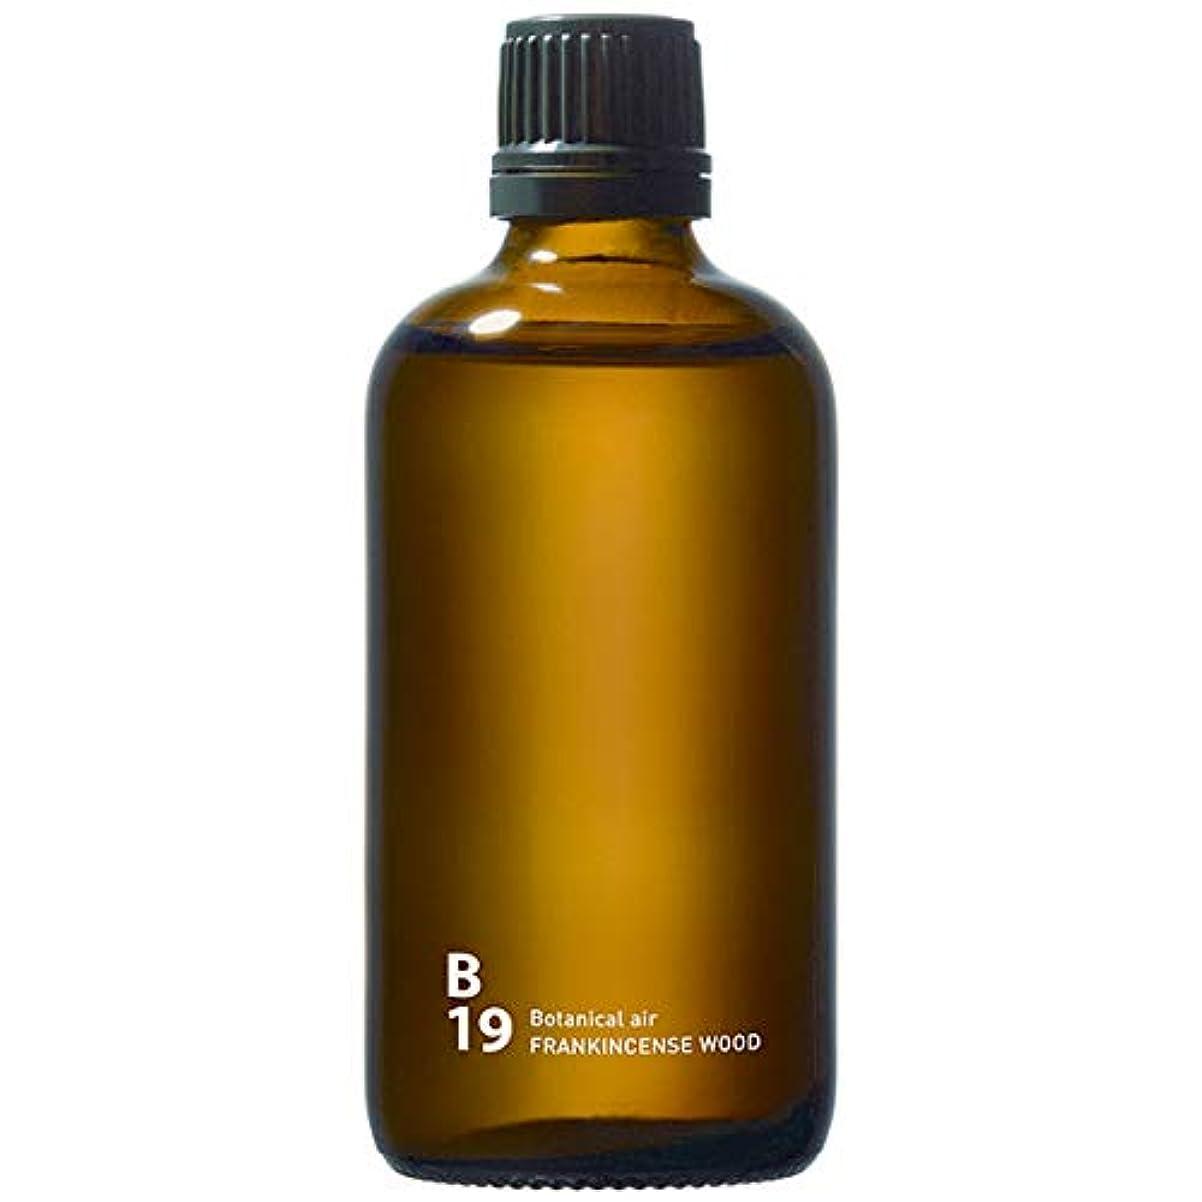 B19 FRANKINCENSE WOOD piezo aroma oil 100ml